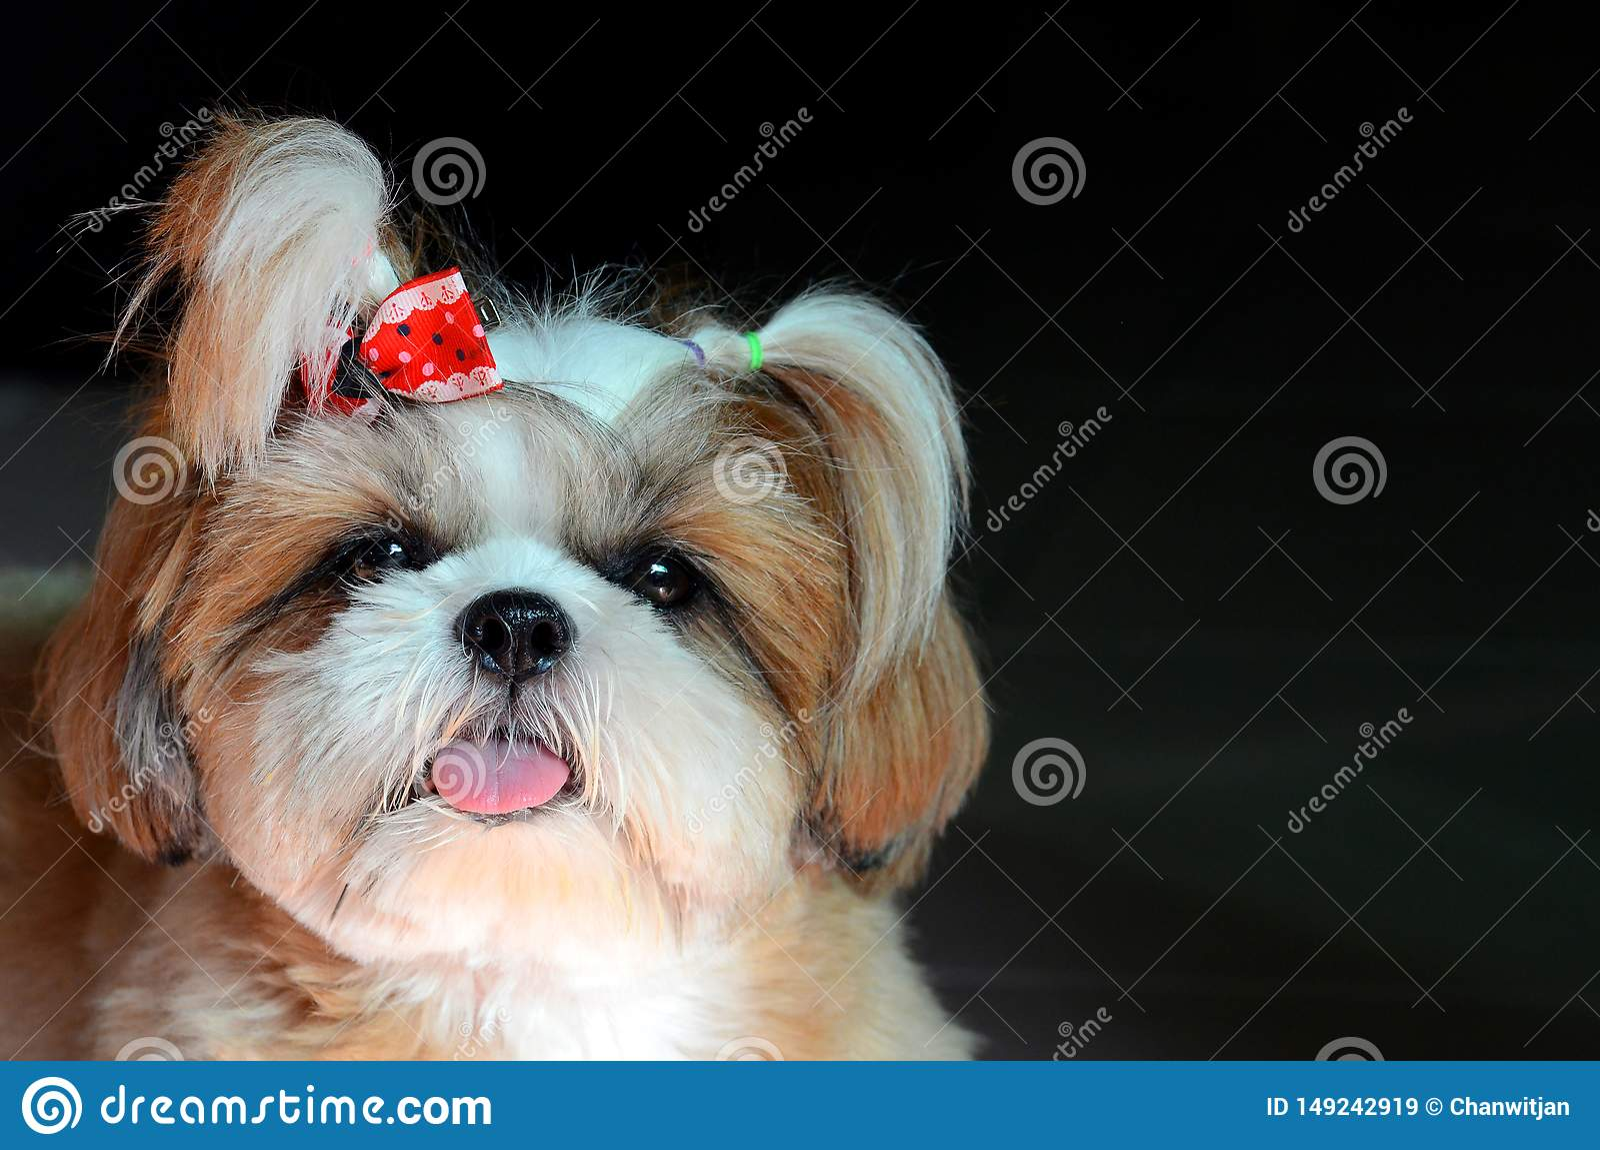 Adorable Shih Tzu dog stare at the camera